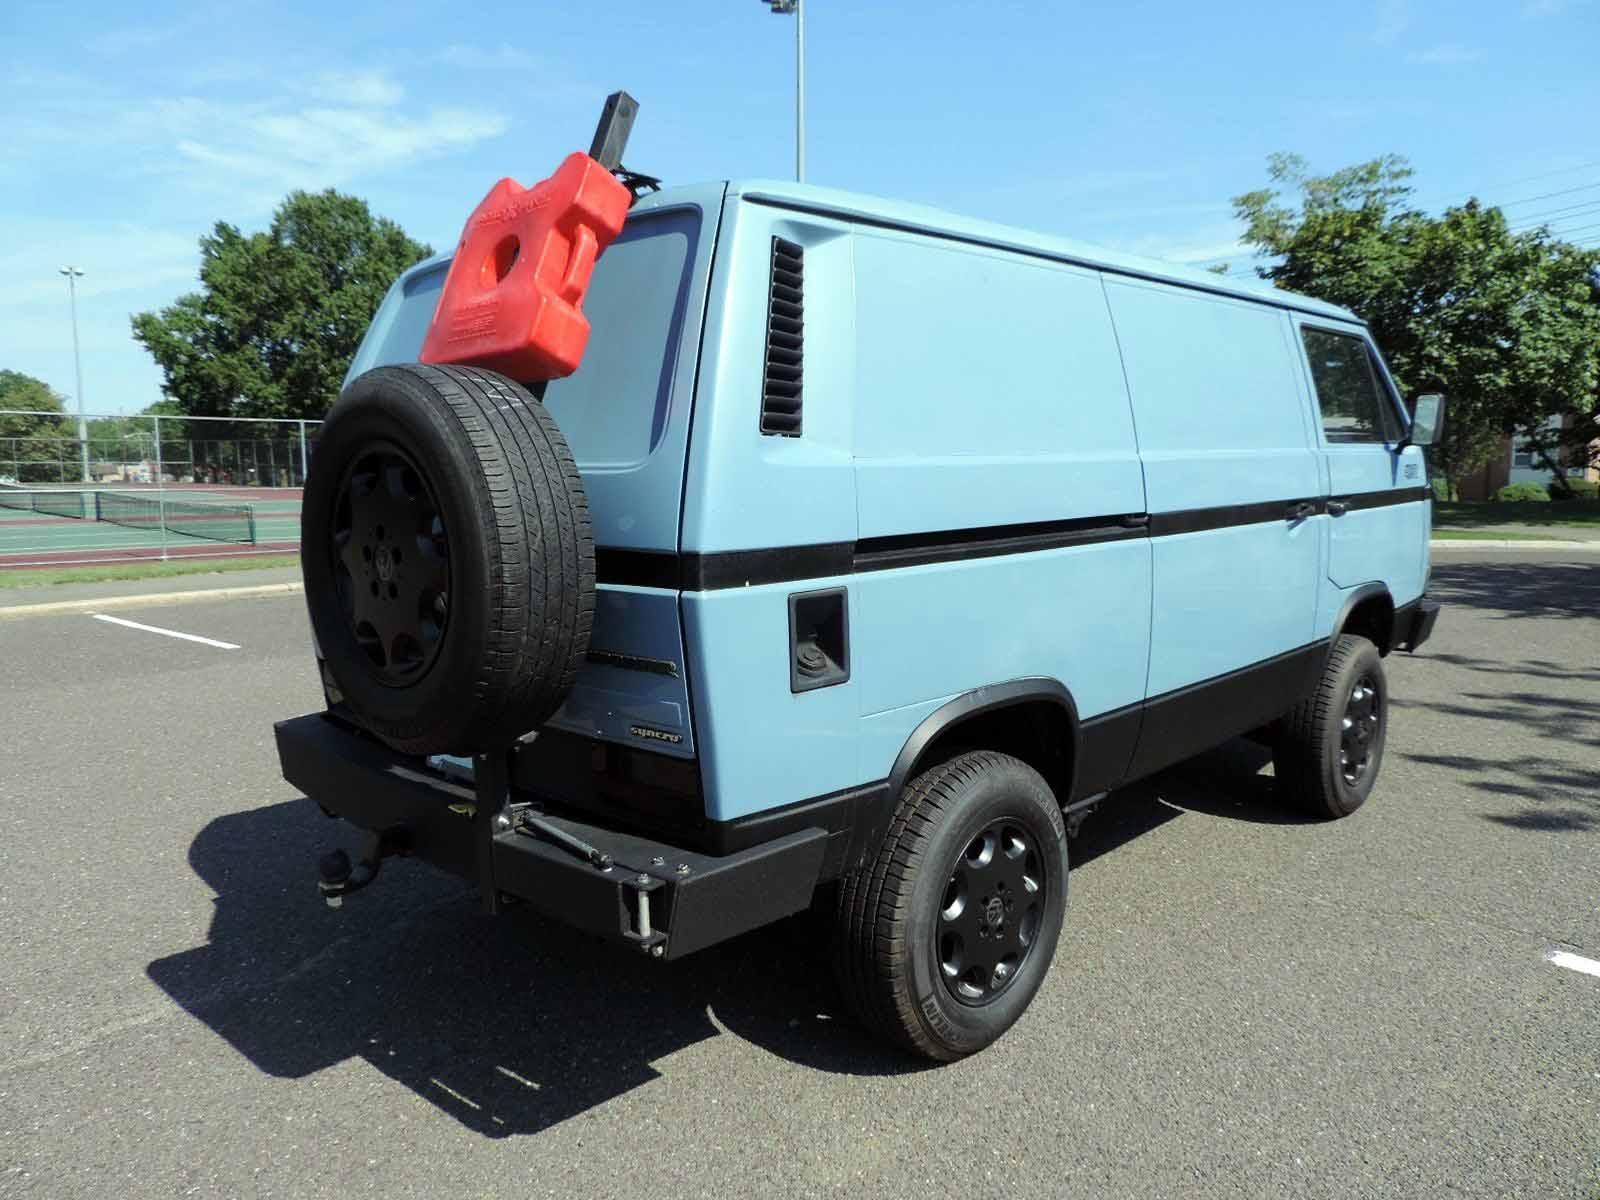 dealership audi a benz mercedes dealer auto co c class used cars llc denver